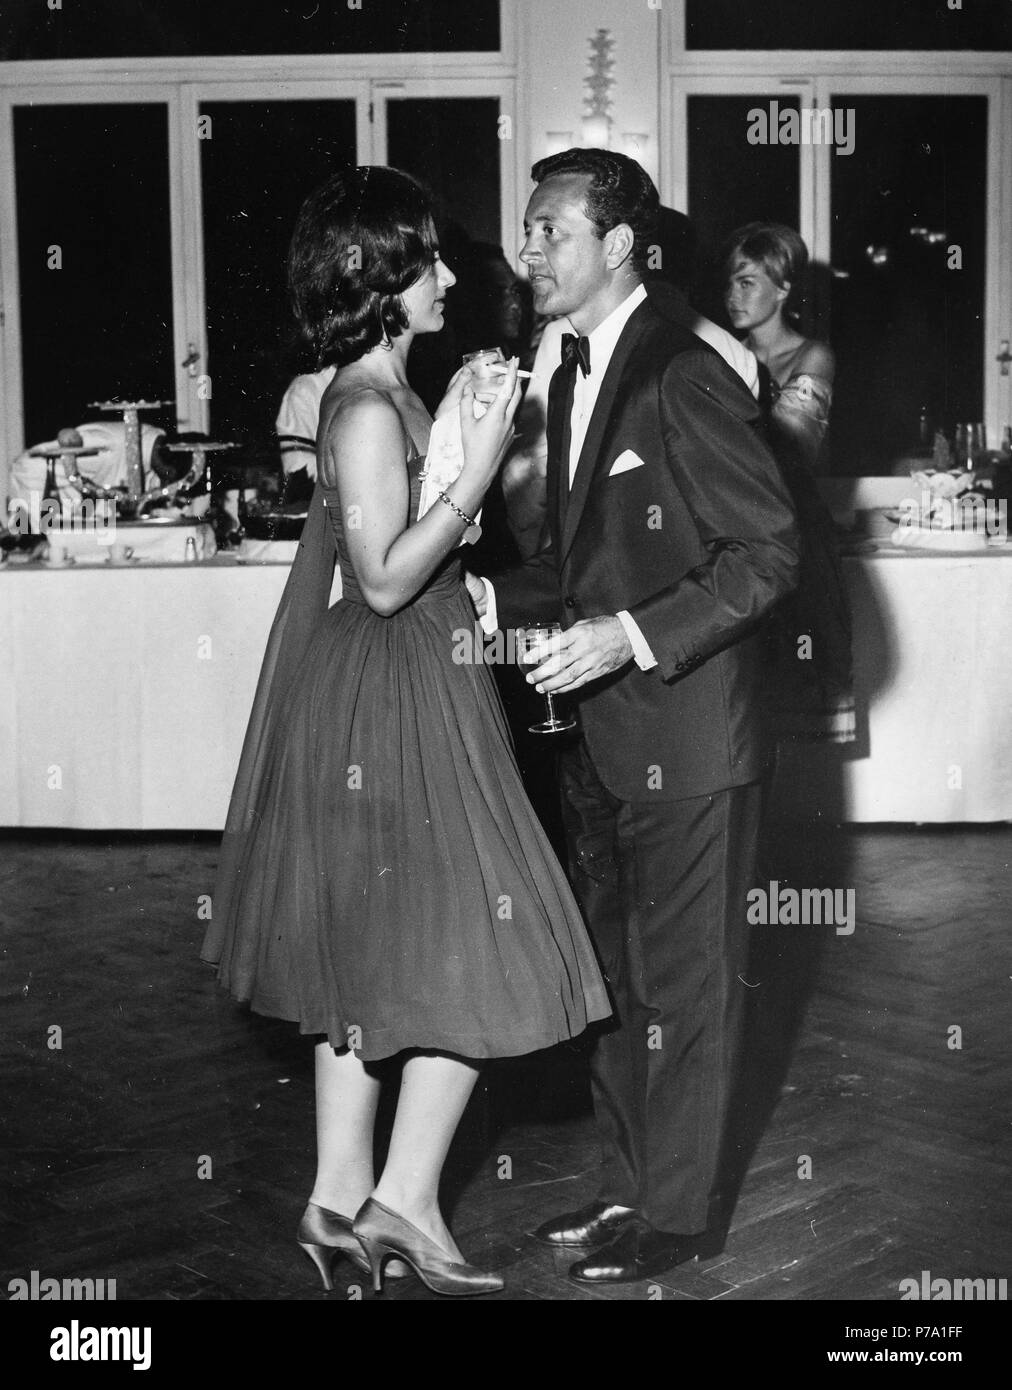 vic damone, 1960 - Stock Image